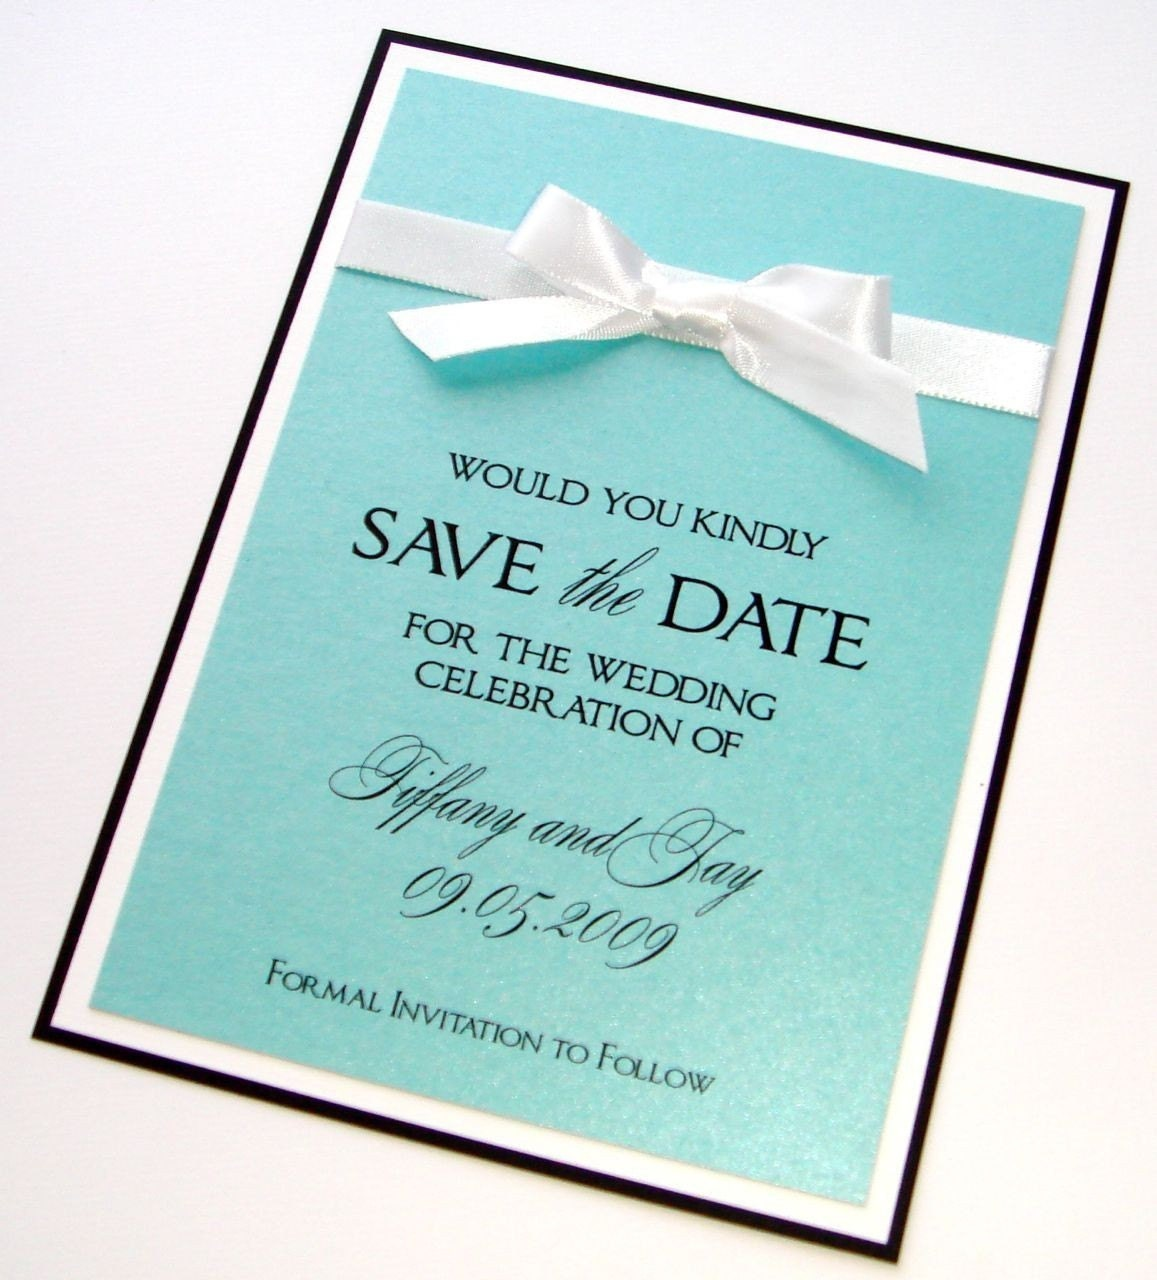 Tiffany Wedding Invitations: TIFFANY SAVE THE DATE SAMPLE